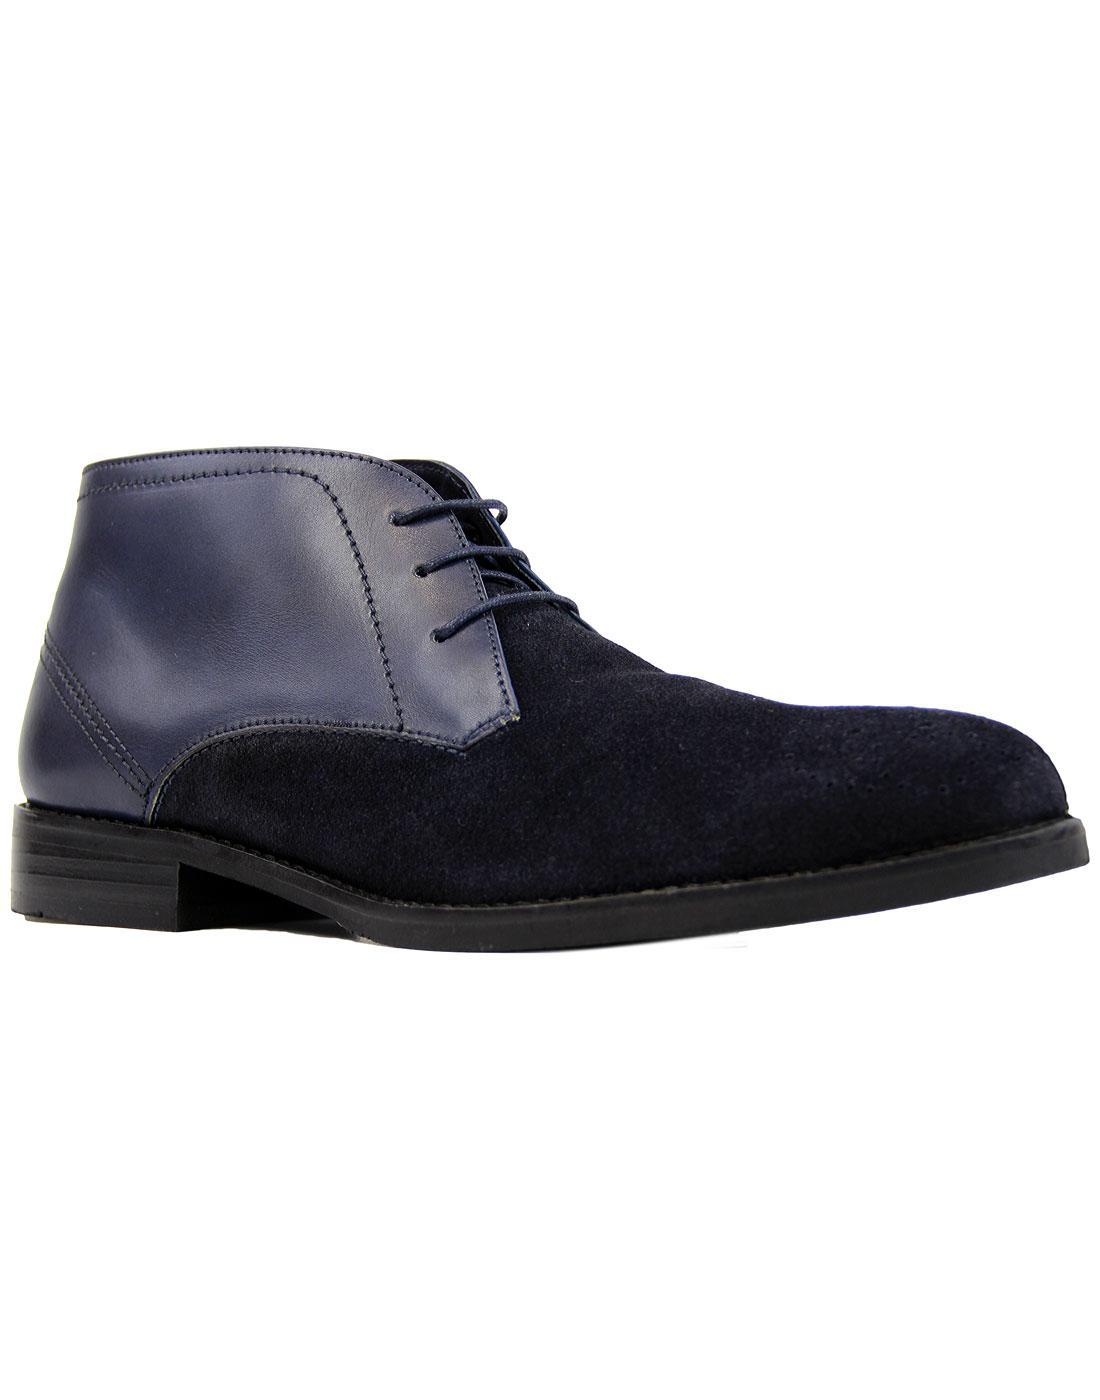 Sorley PAOLO VANDINI 60s Mod Brogue Desert Boots N